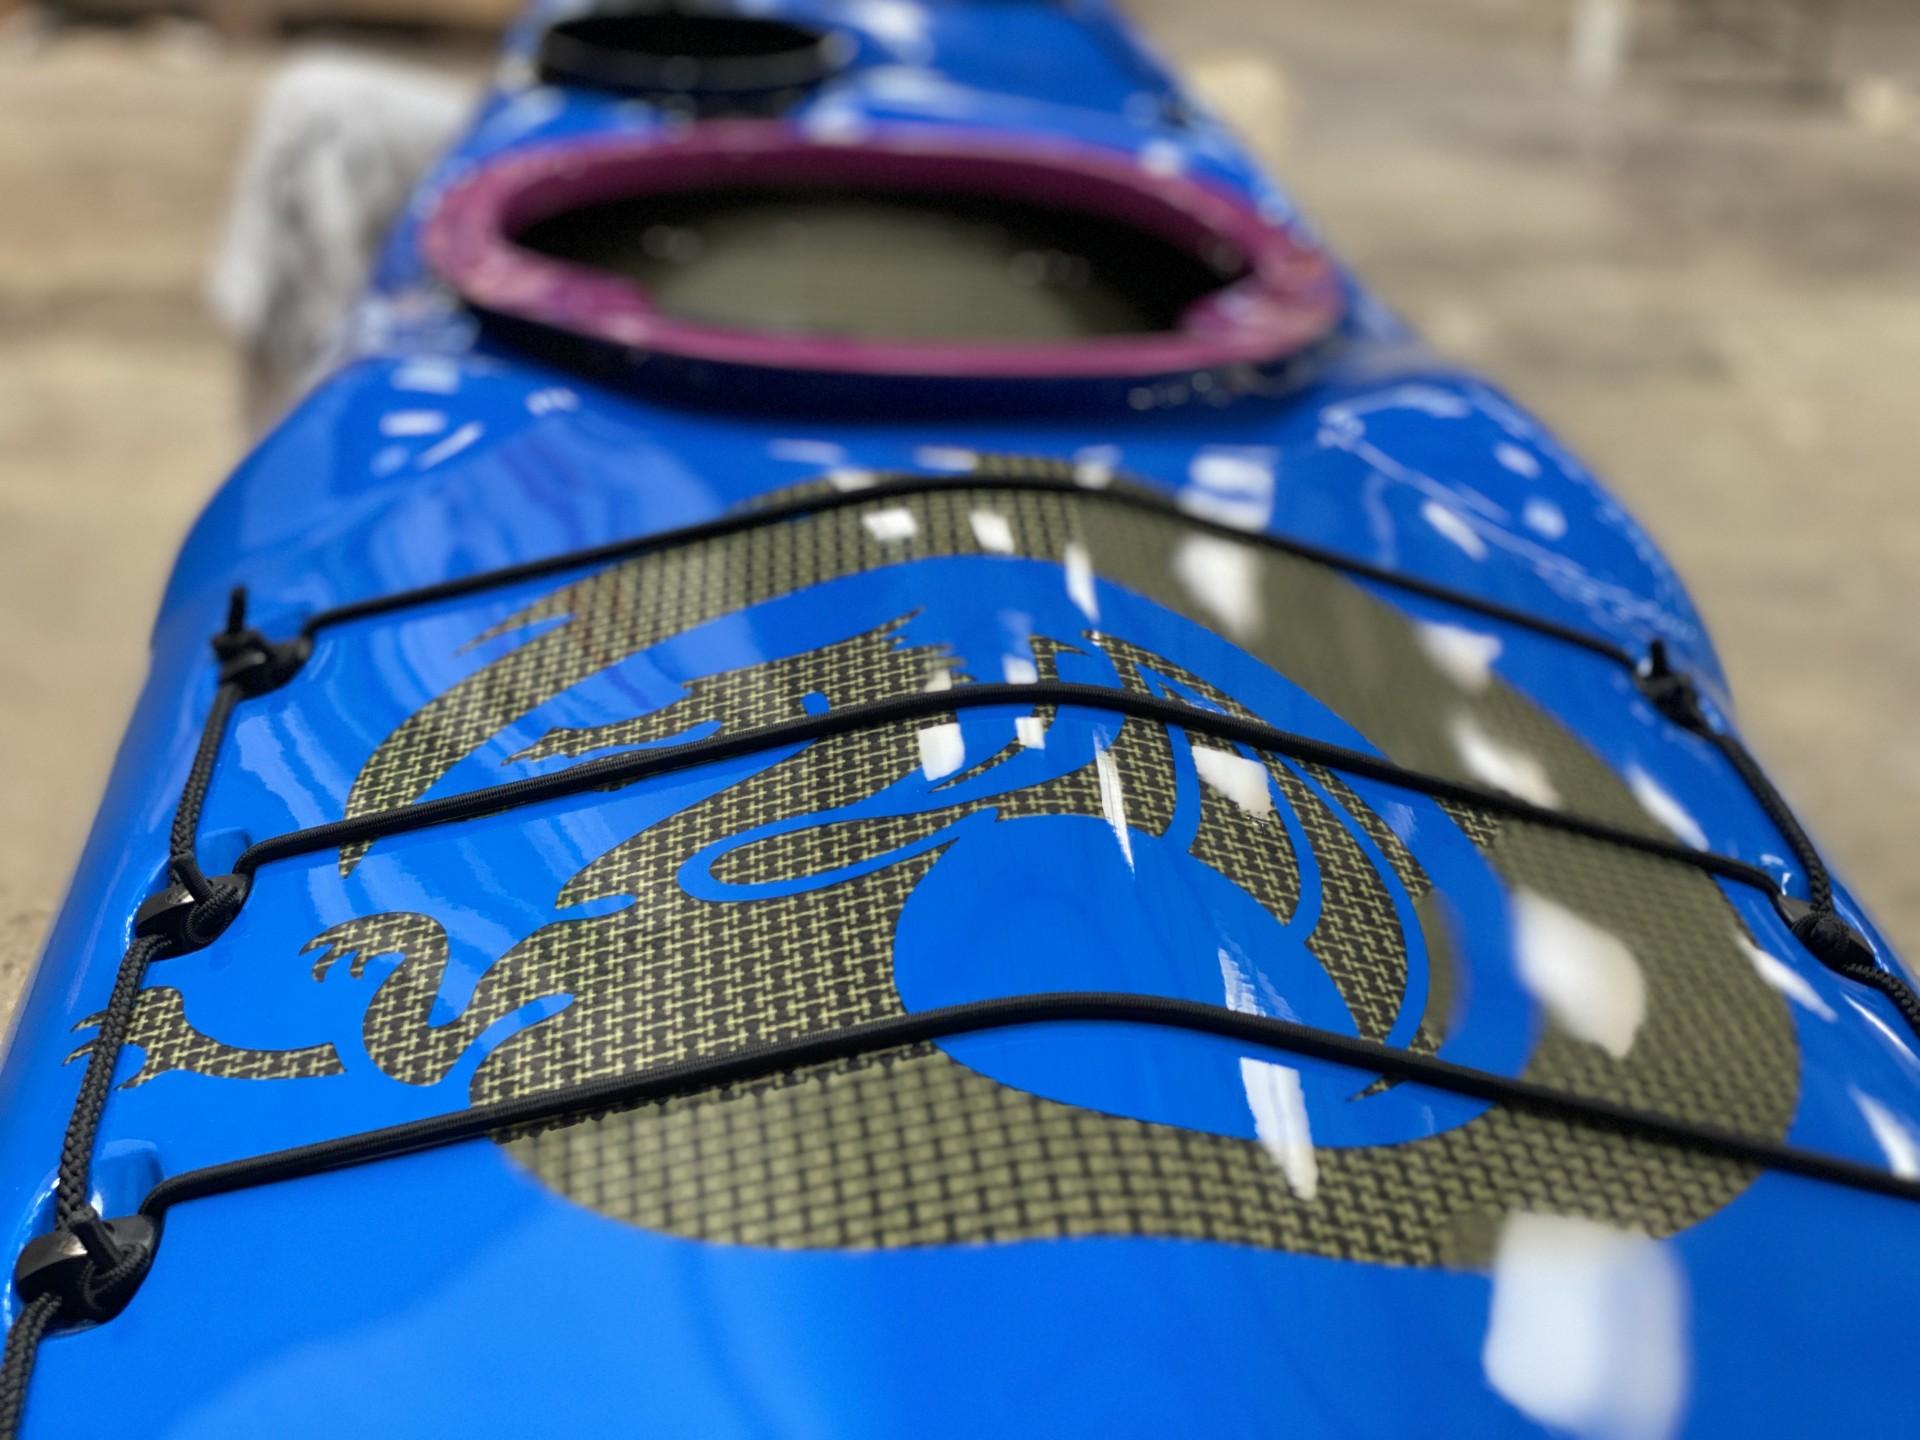 Romany Excel Expedition sea kayak Nigel Dennis blue on carbon composite